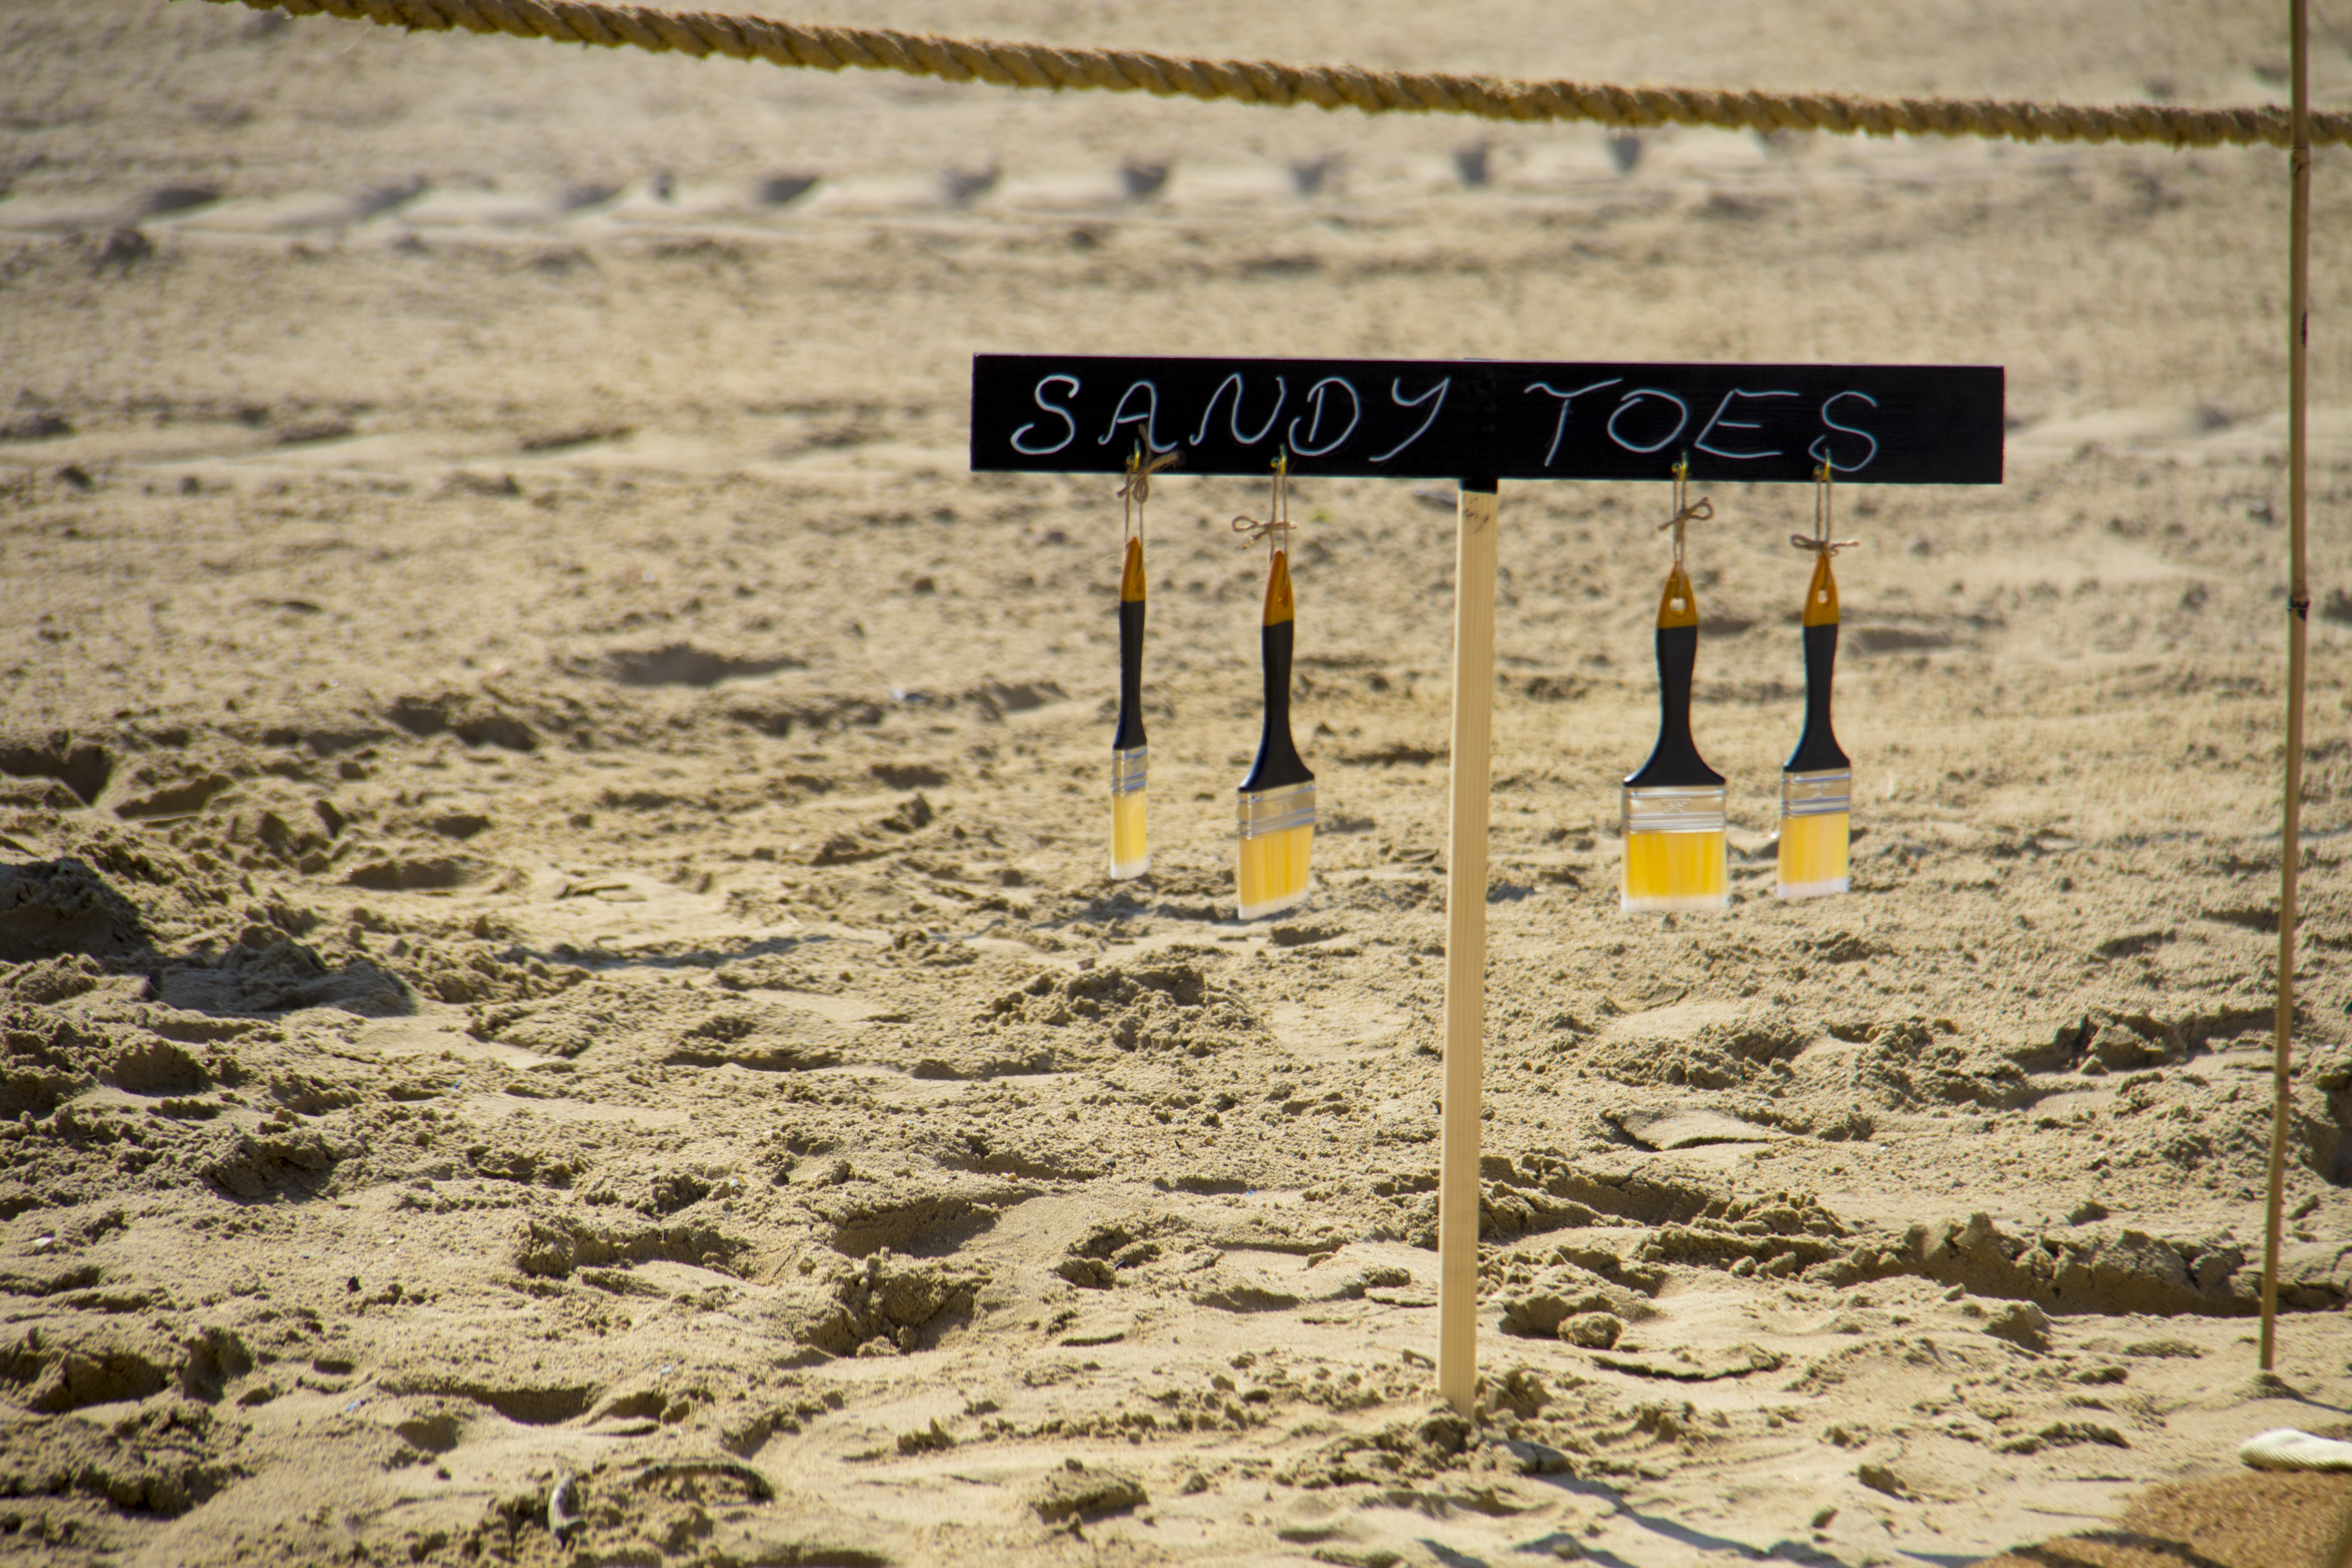 Sandy Toes paint brush